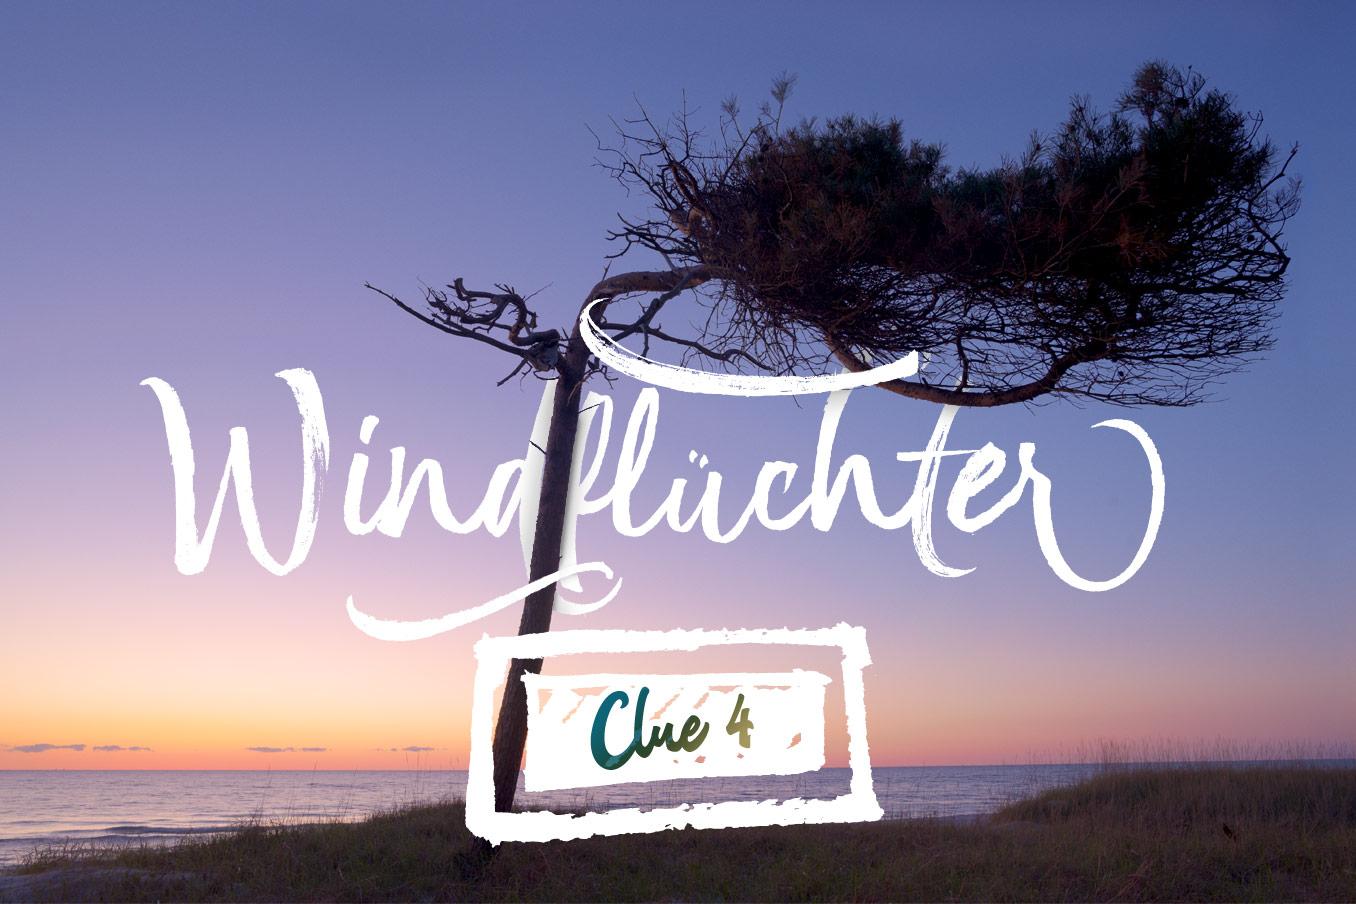 Windflüchter M-CAL Clue 4